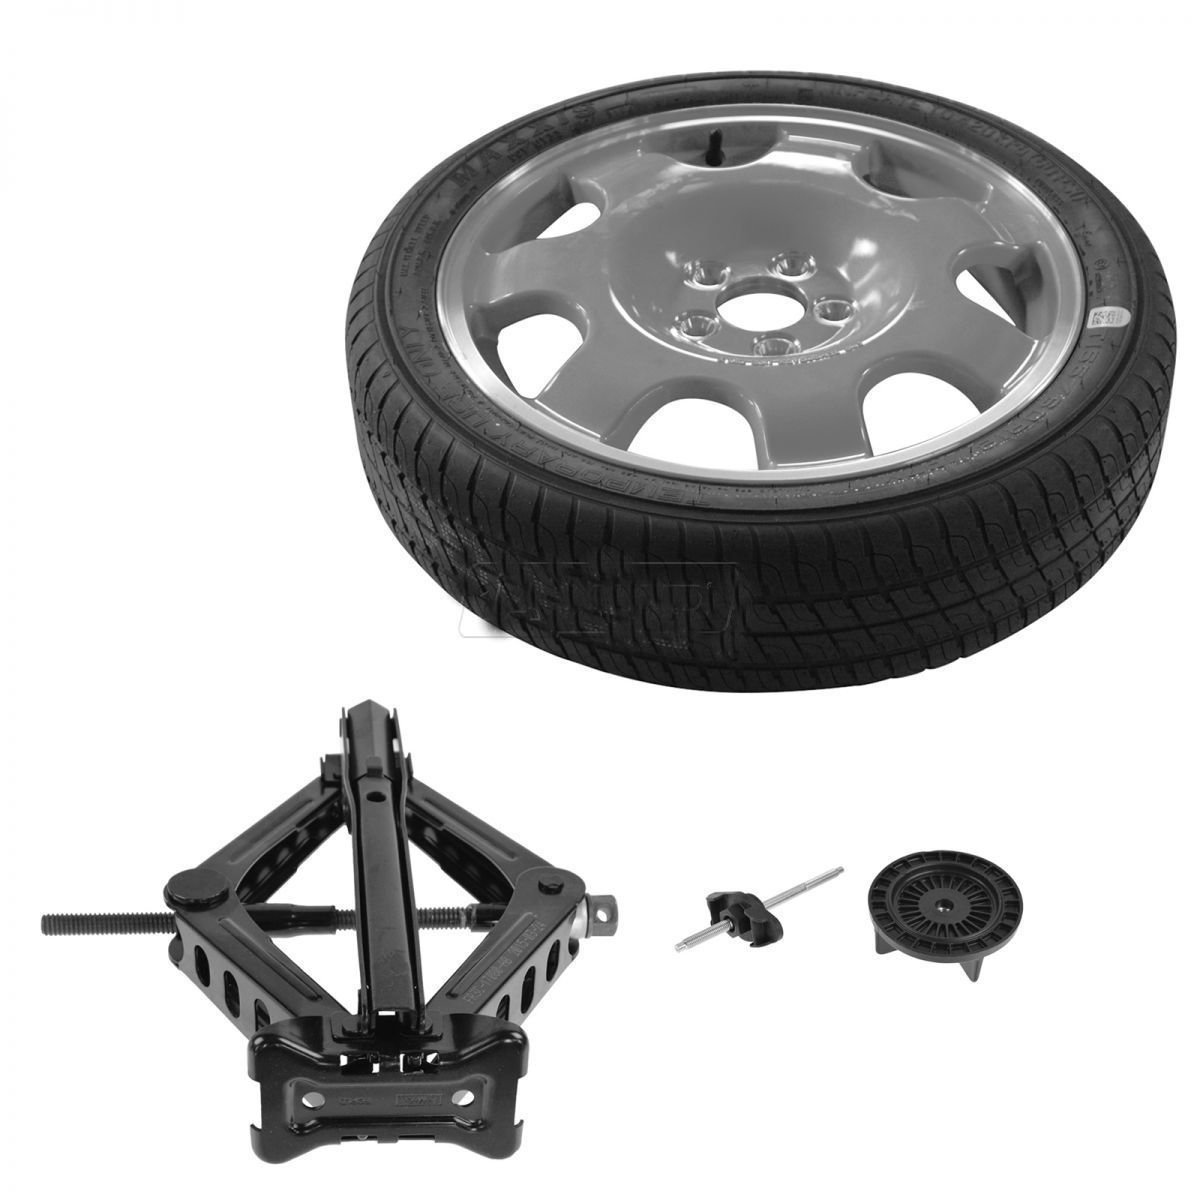 I4 And Gt For V6 Ford FR3Z-1K007-C Spare Tire Kit Mini